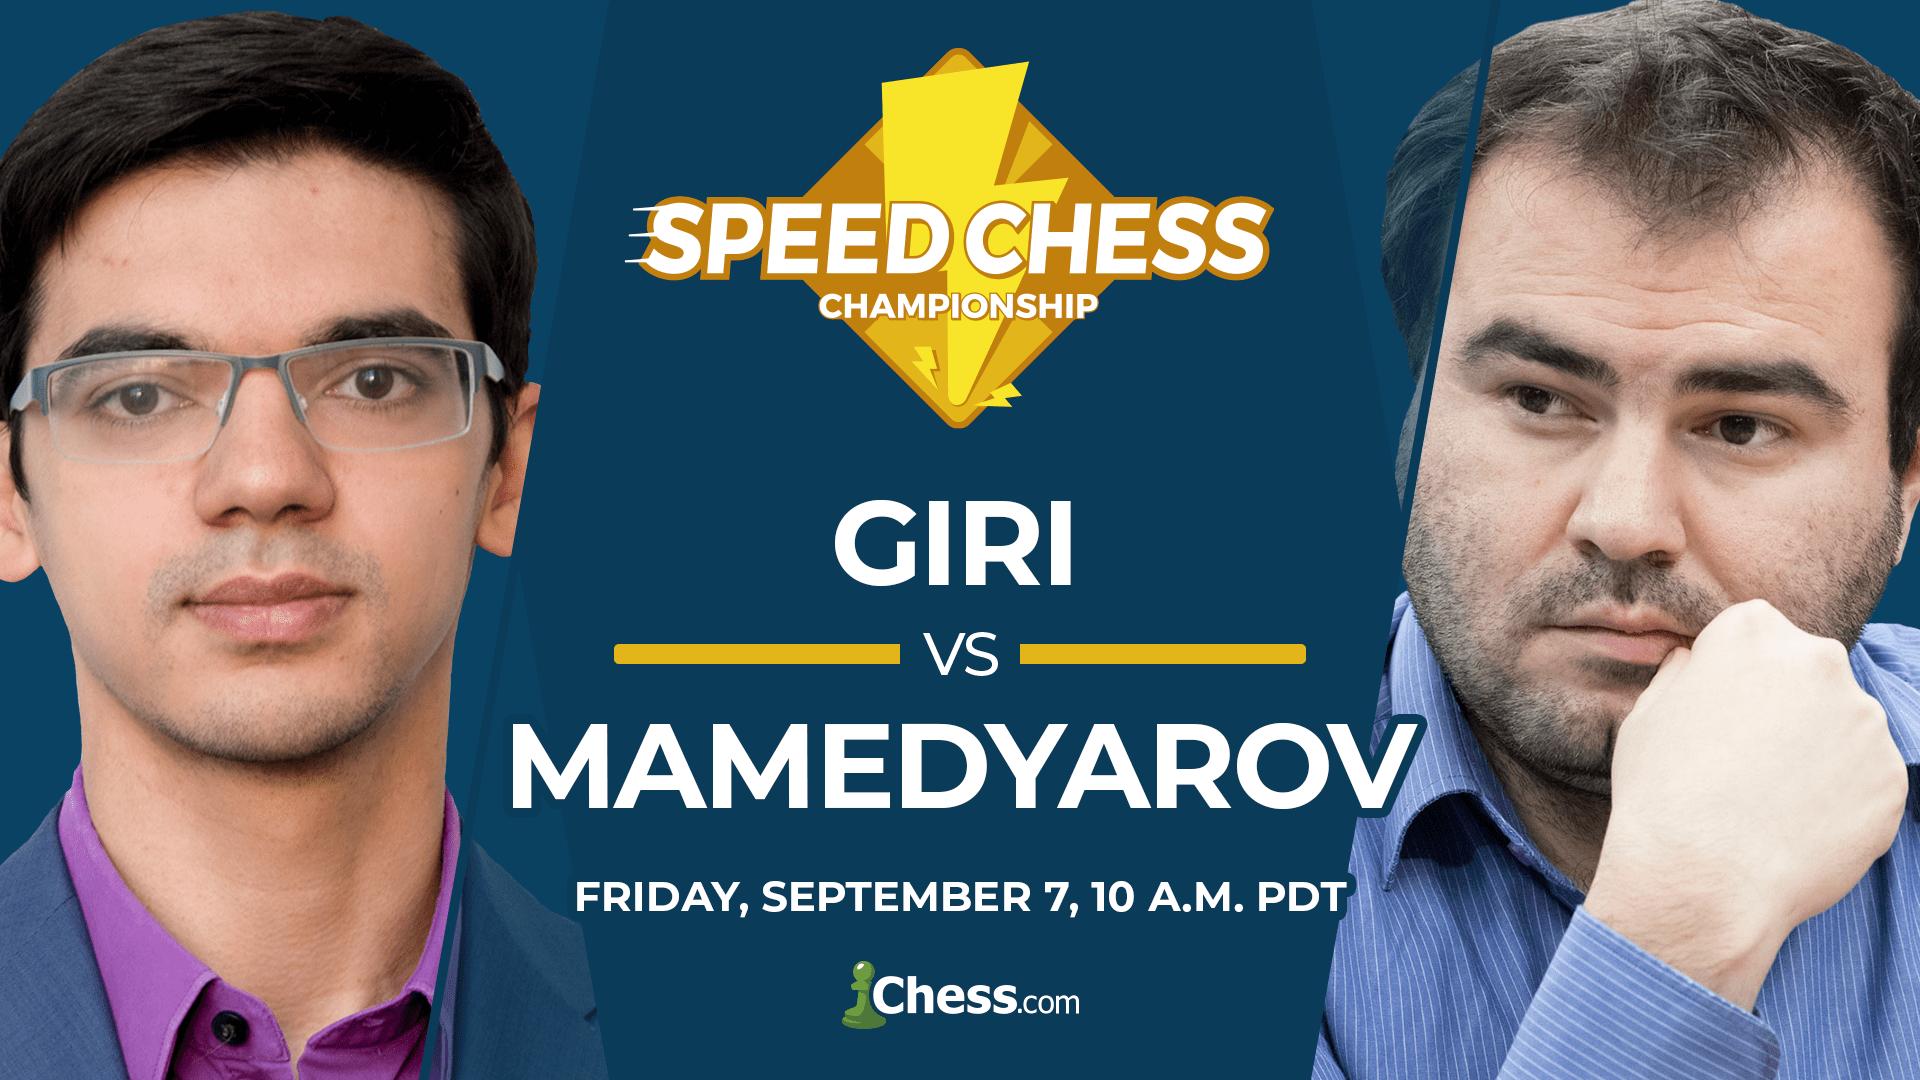 Giri vs Mamedyarov: Friday, September 7, 10 a.m. PDT